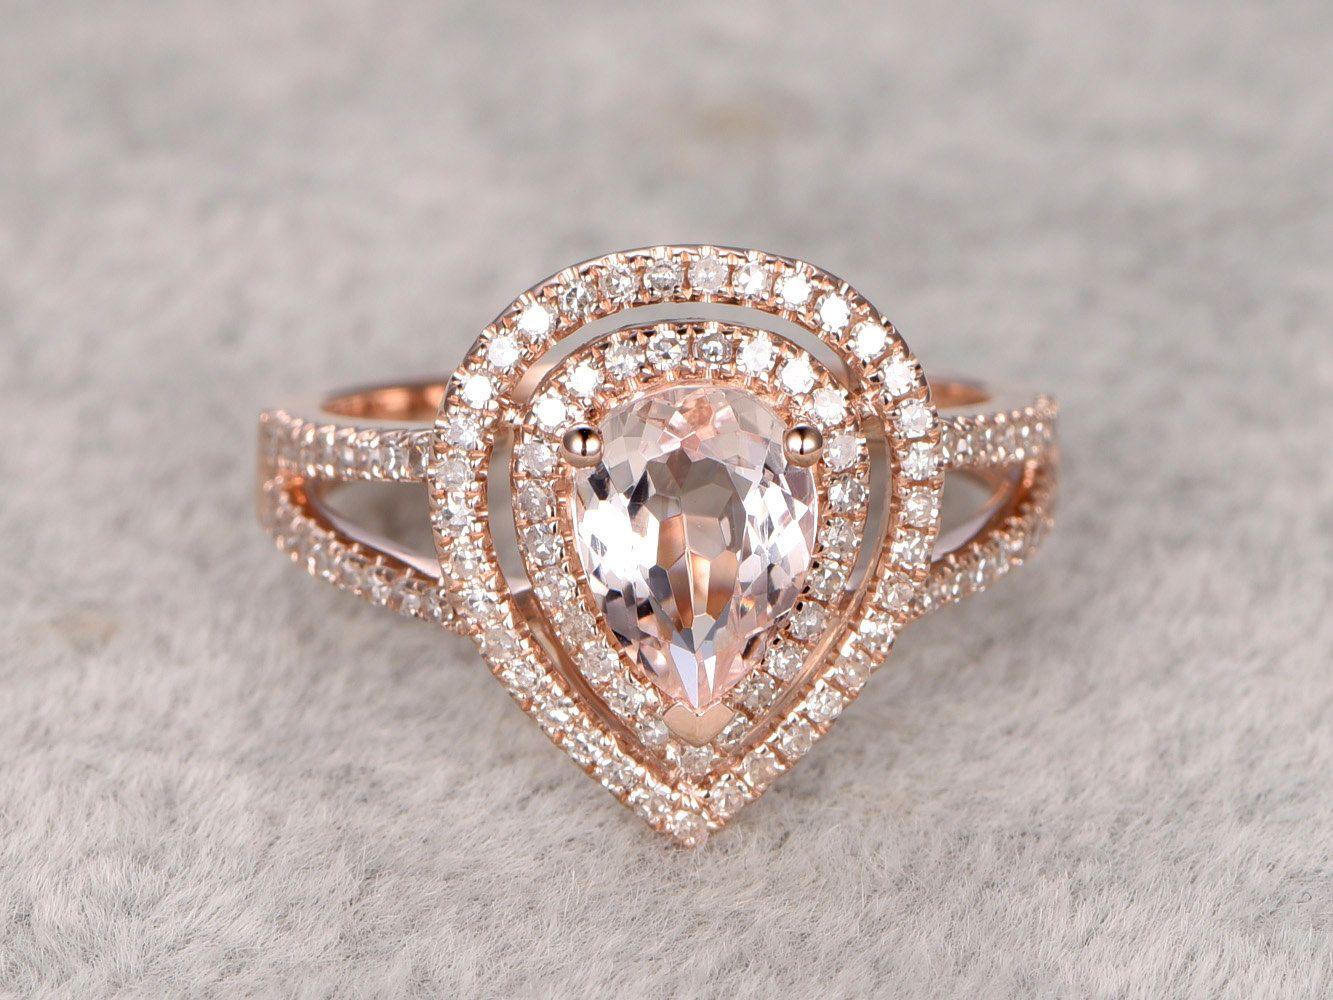 Morganite engagement ring rose golddouble halo diamond wedding band